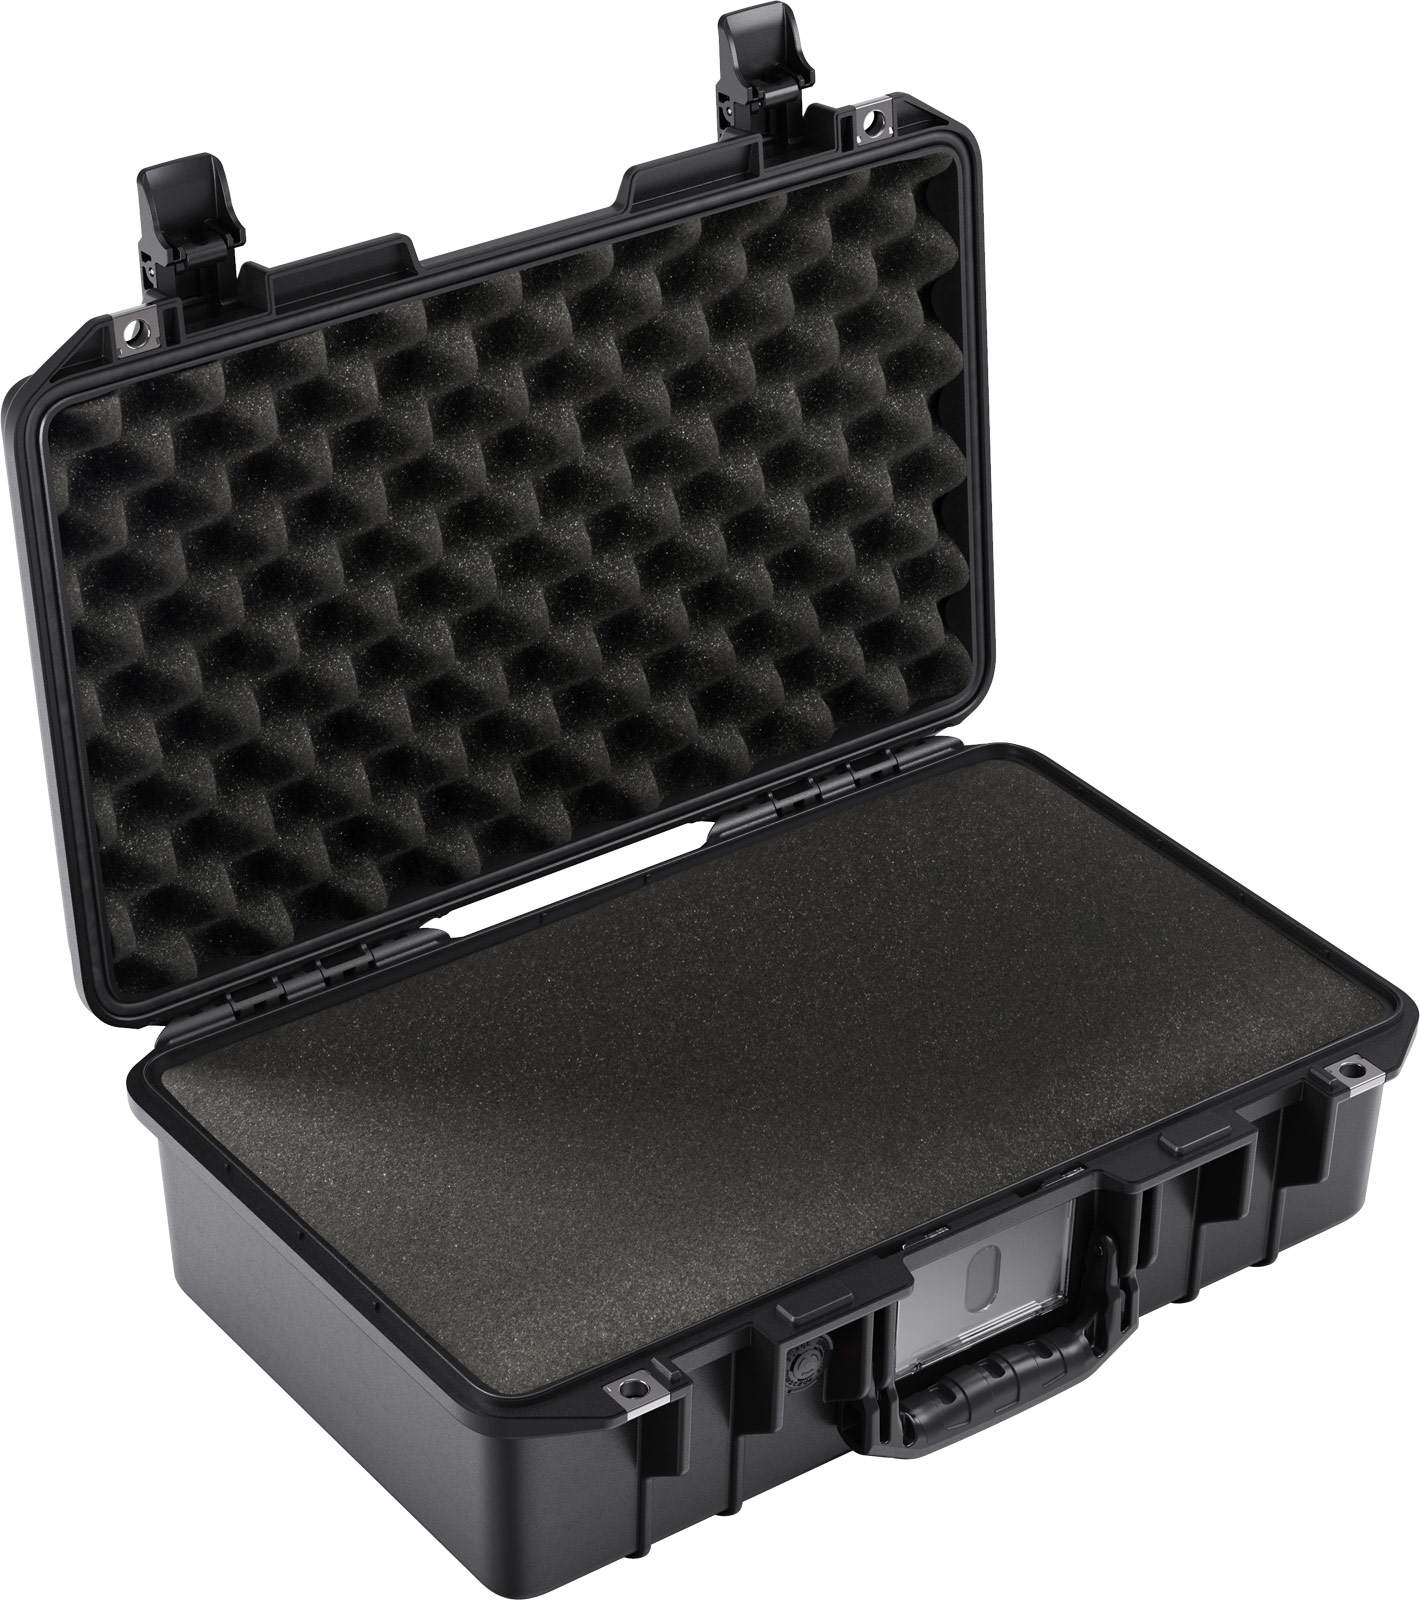 pelican air case 1485 foam protection cases